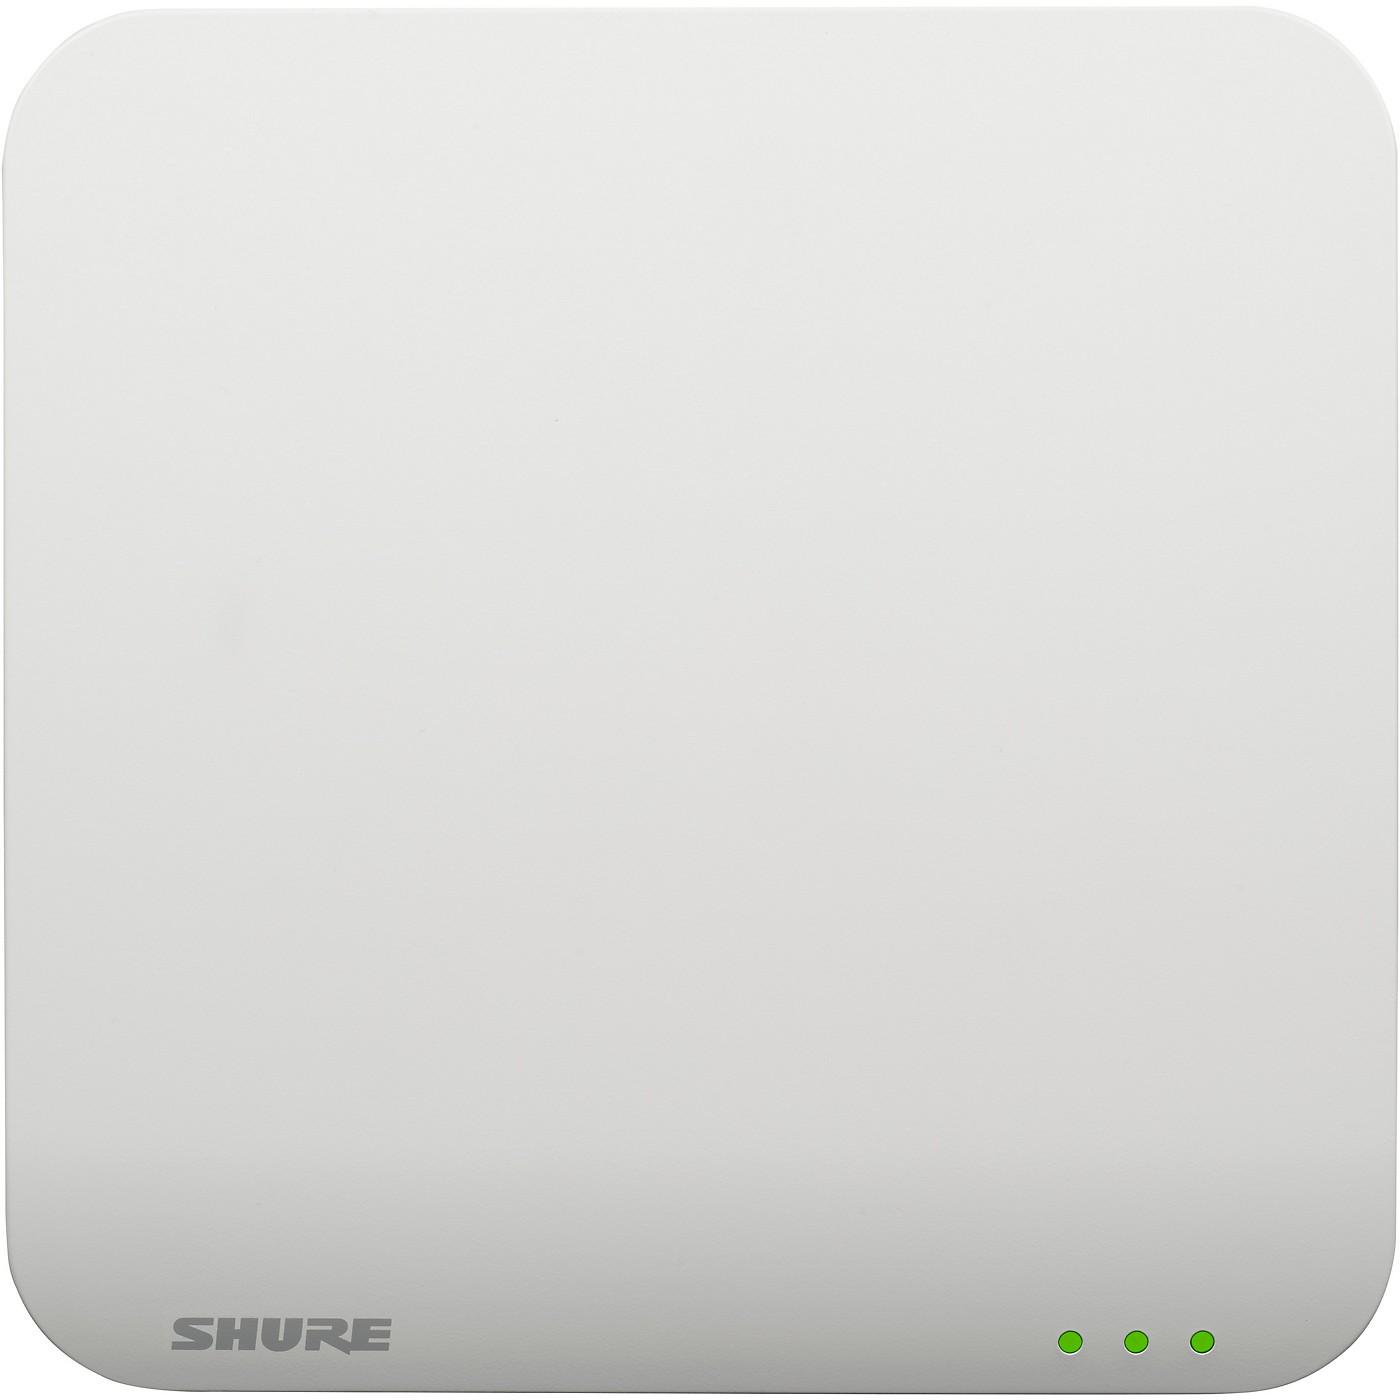 Shure MXWAPT2 Microflex Access Point Transceiver thumbnail